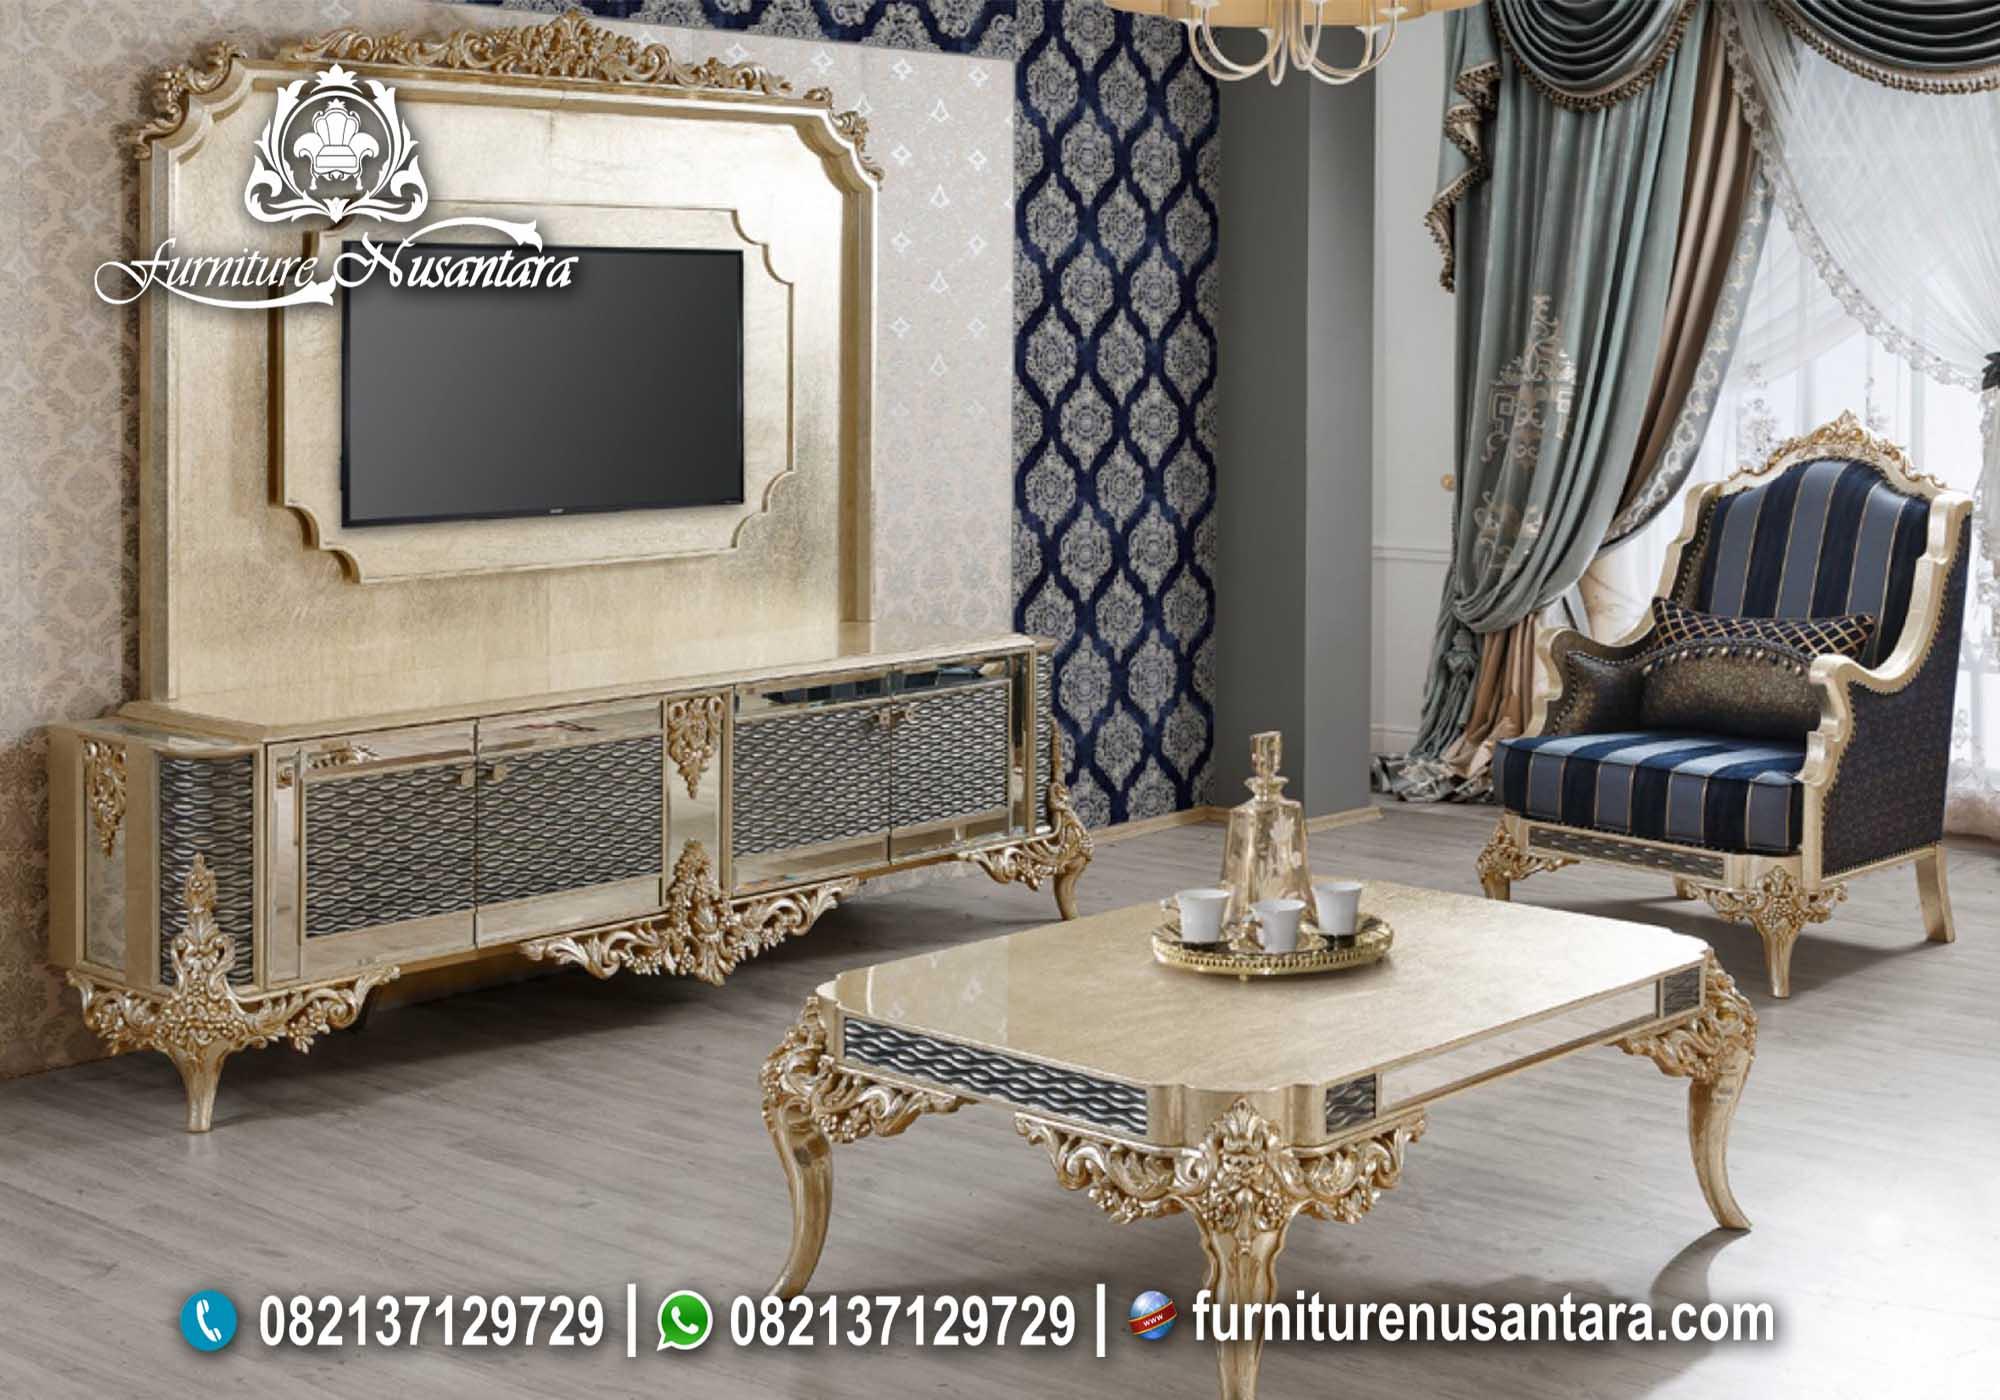 Backdrop TV Klasik Full Gold Turki BTV-15